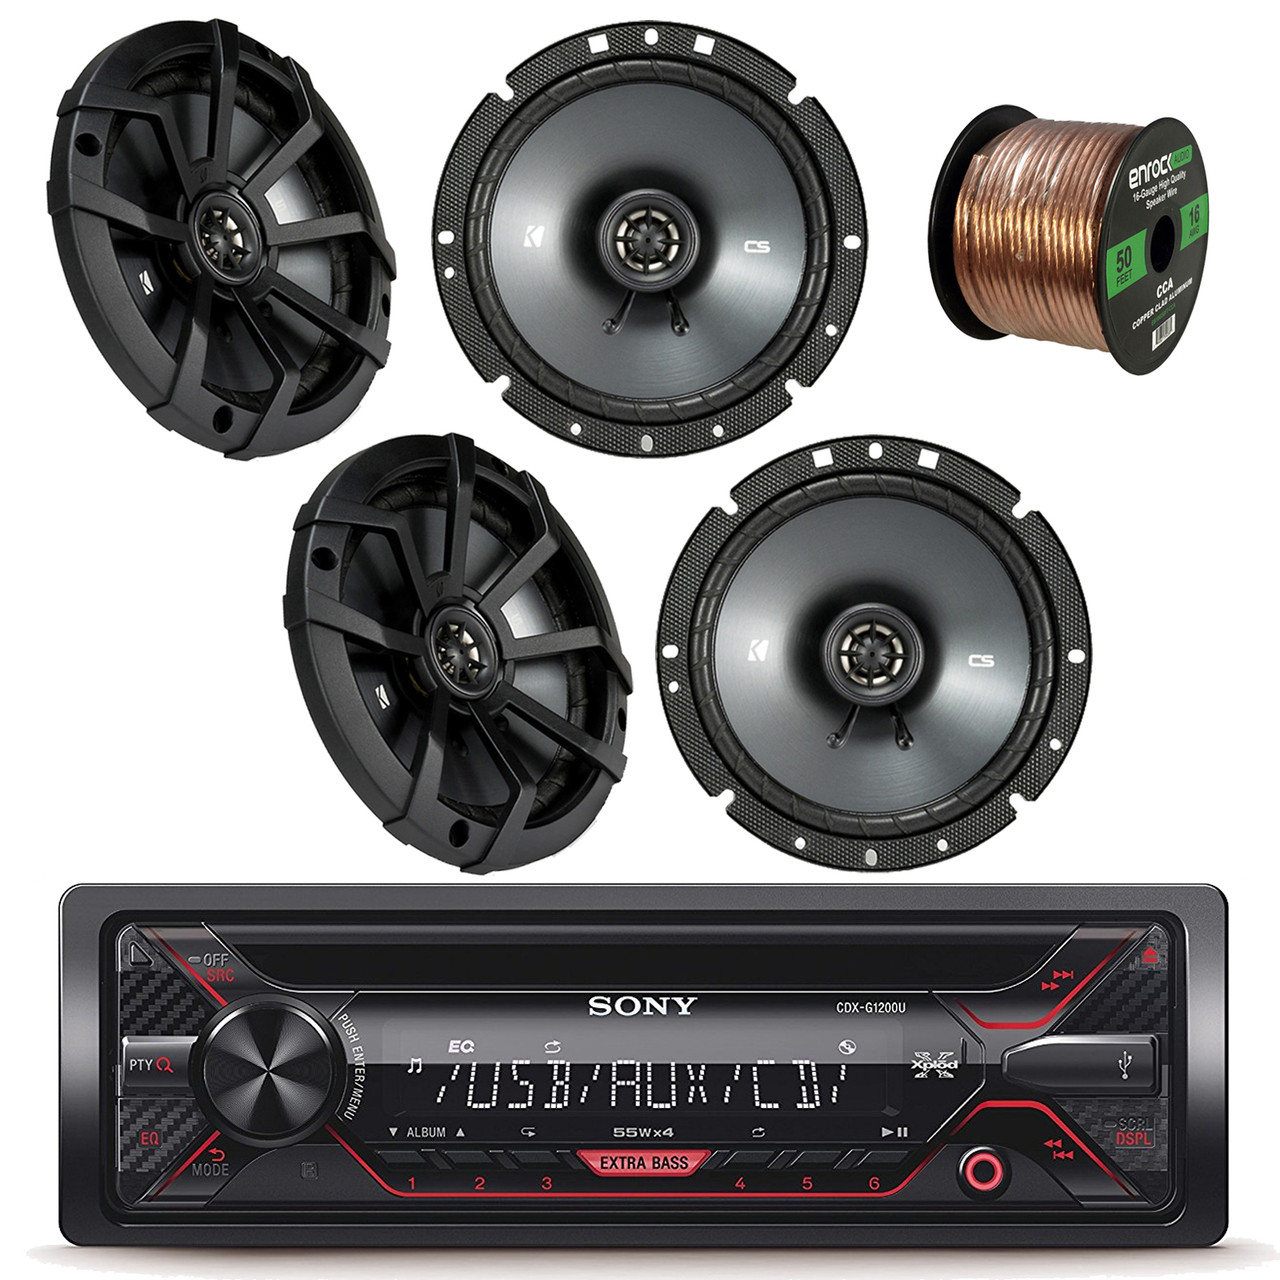 small resolution of sony xplod cdxg1200u receiver with 52x4 watt amp with kicker 43csc674 6 3 4 inch 600 watt cs series black car coaxial speakers 2 pairs enrock audio